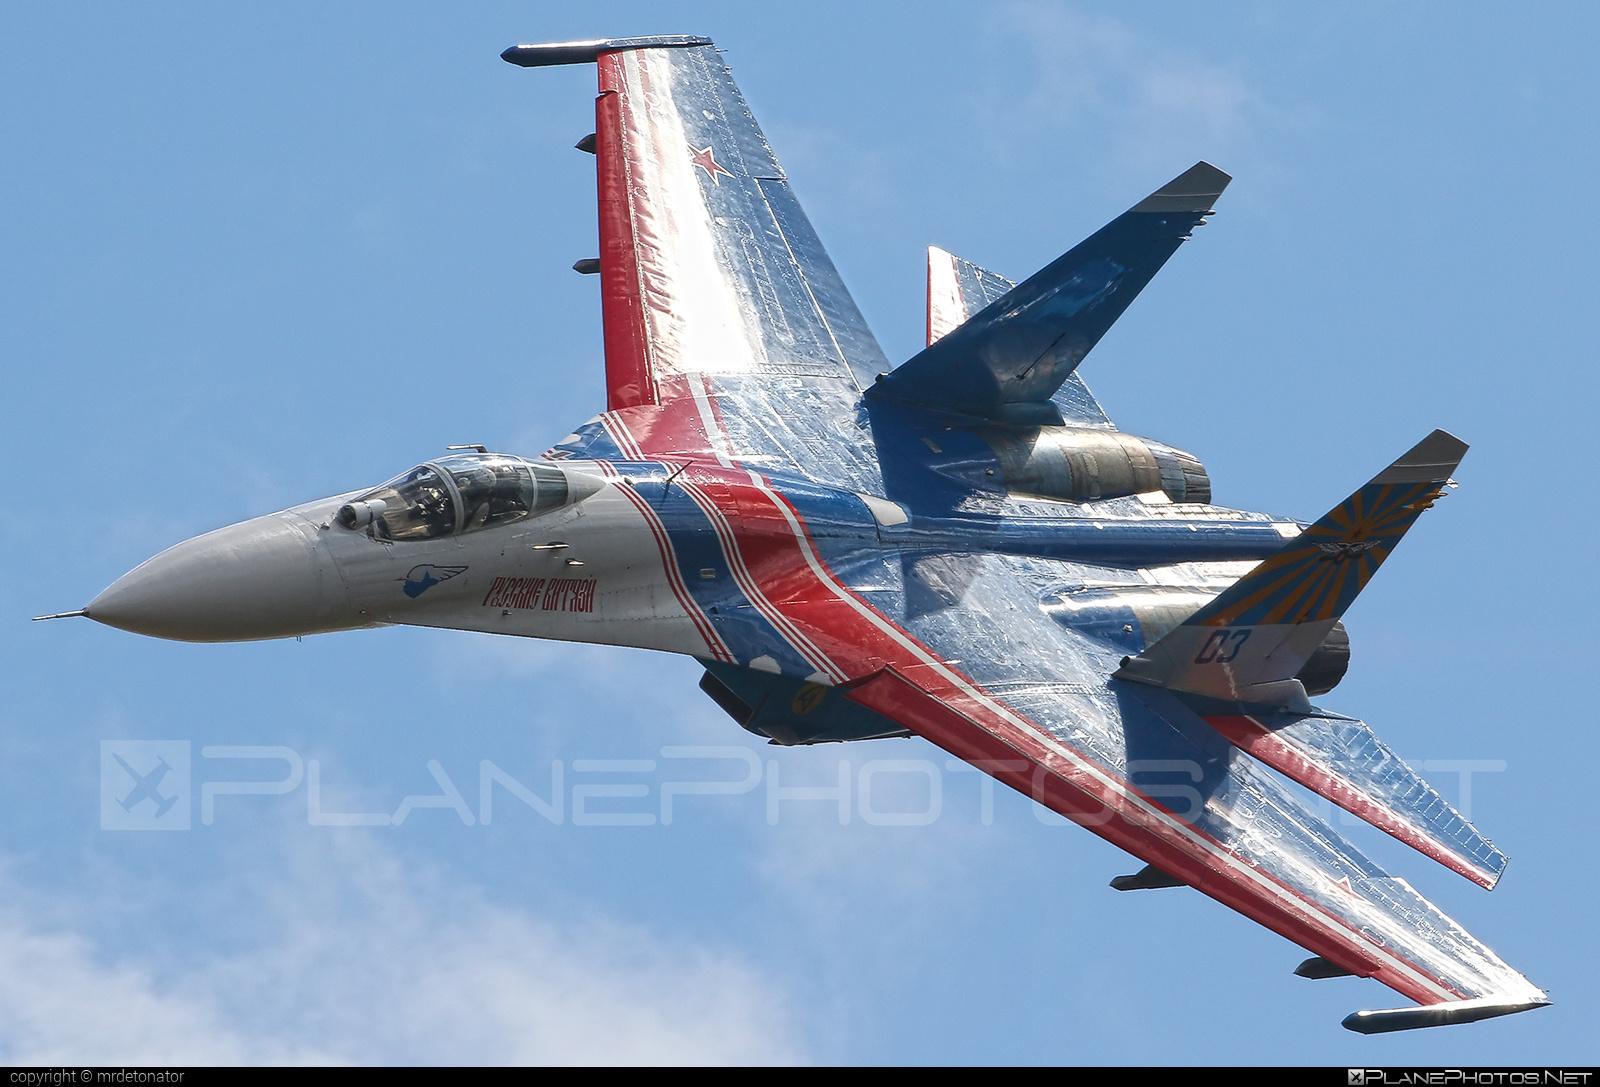 Sukhoi Su-27P - 03 operated by Voyenno-vozdushnye sily Rossii (Russian Air Force) #maks2015 #su27 #su27p #sukhoi #sukhoi27